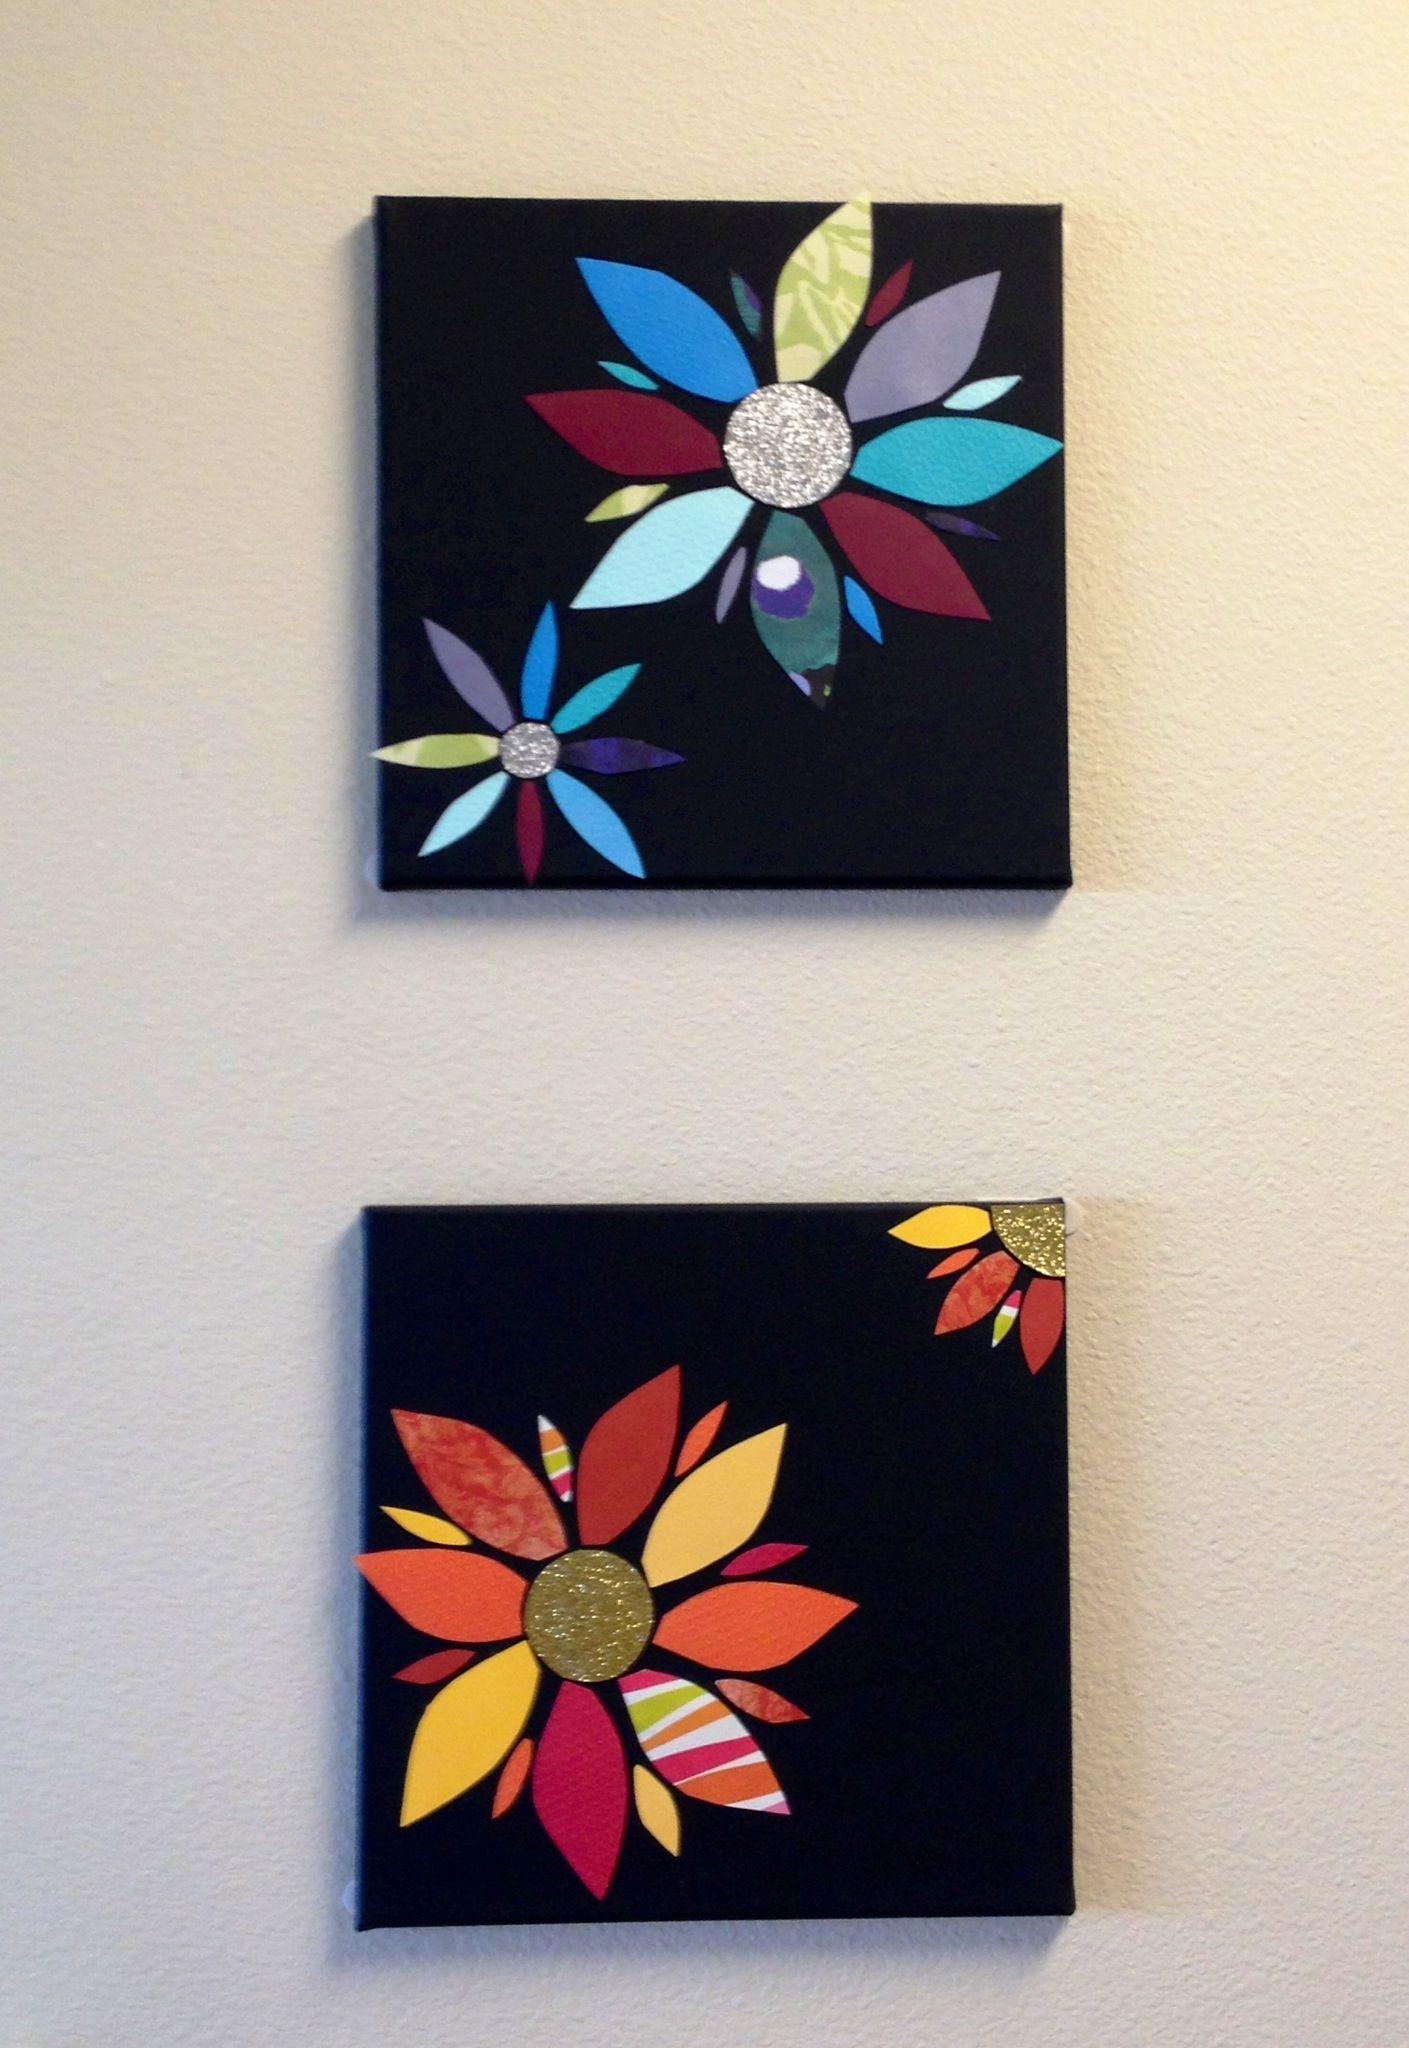 Scrapbook paper craft ideas - Scrapbook Paper Flowers On Canvas Board